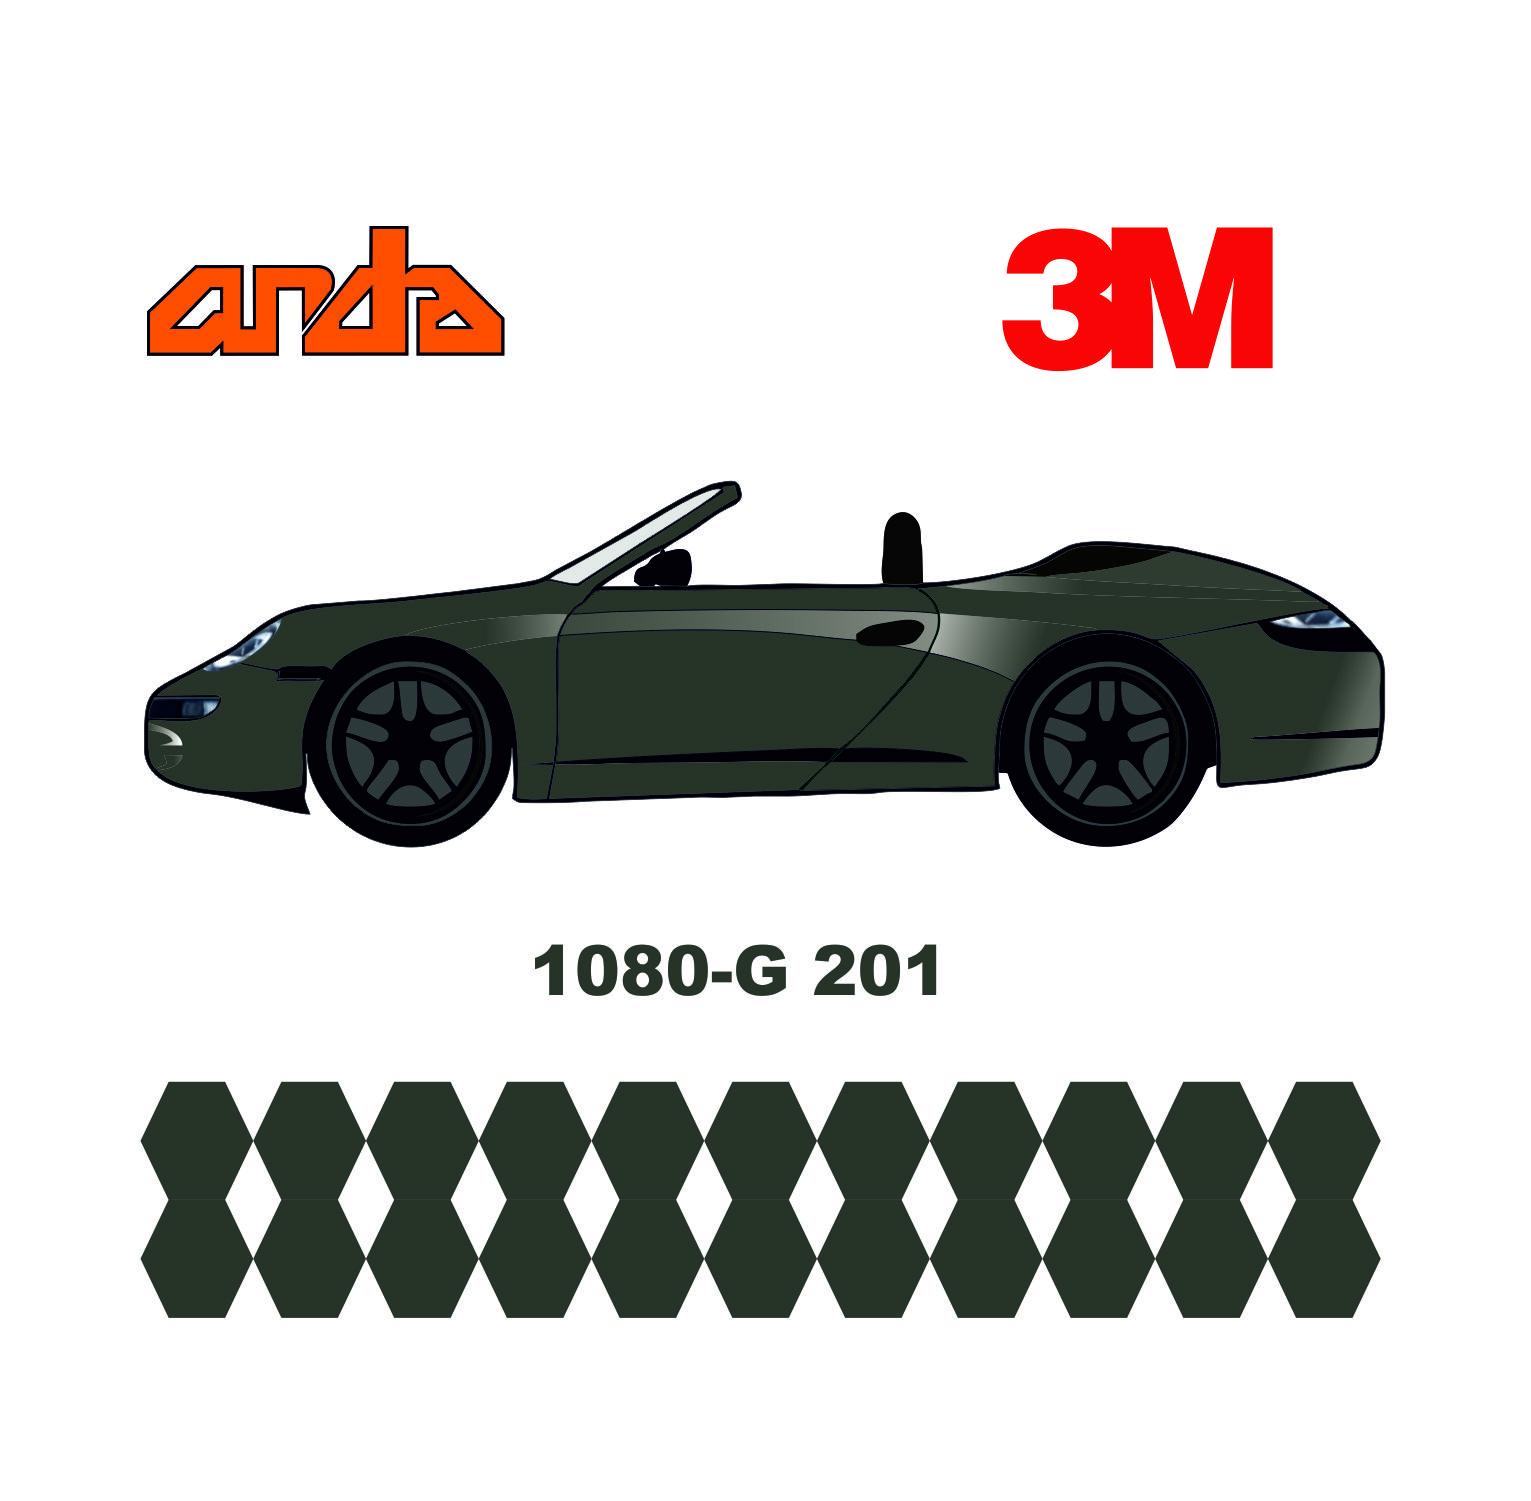 3M 1080-G201 Parlak Antrasit 1